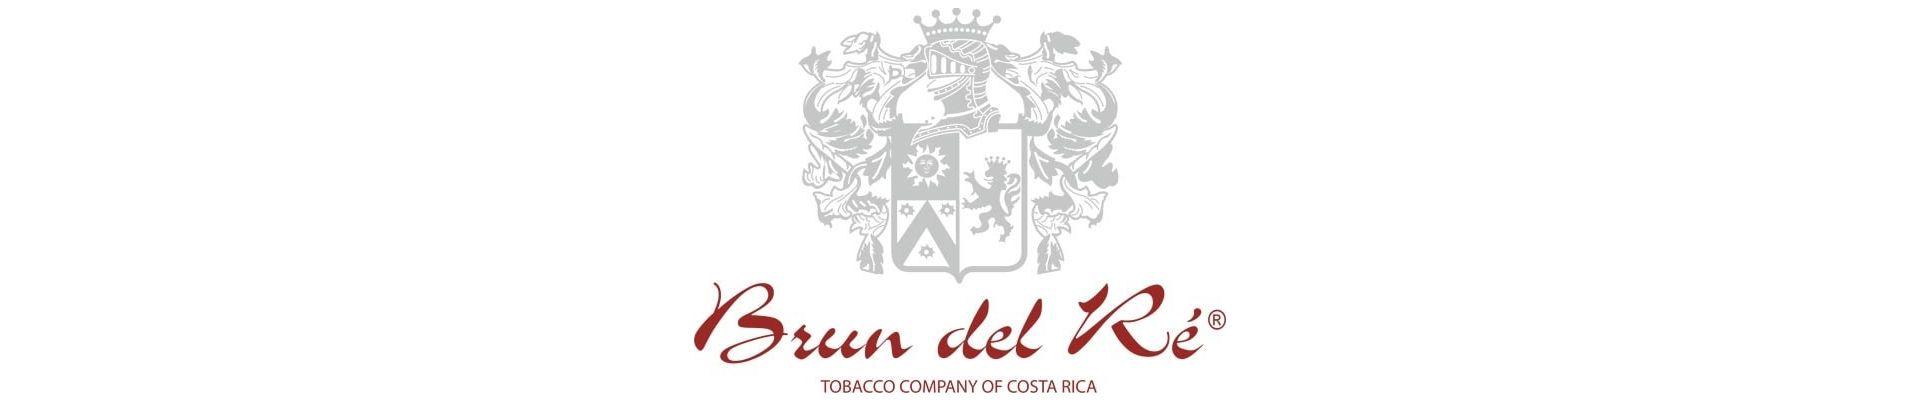 Magazin tigari de foi Brun del Re cu livrare rapida.Tigari Brun del Re